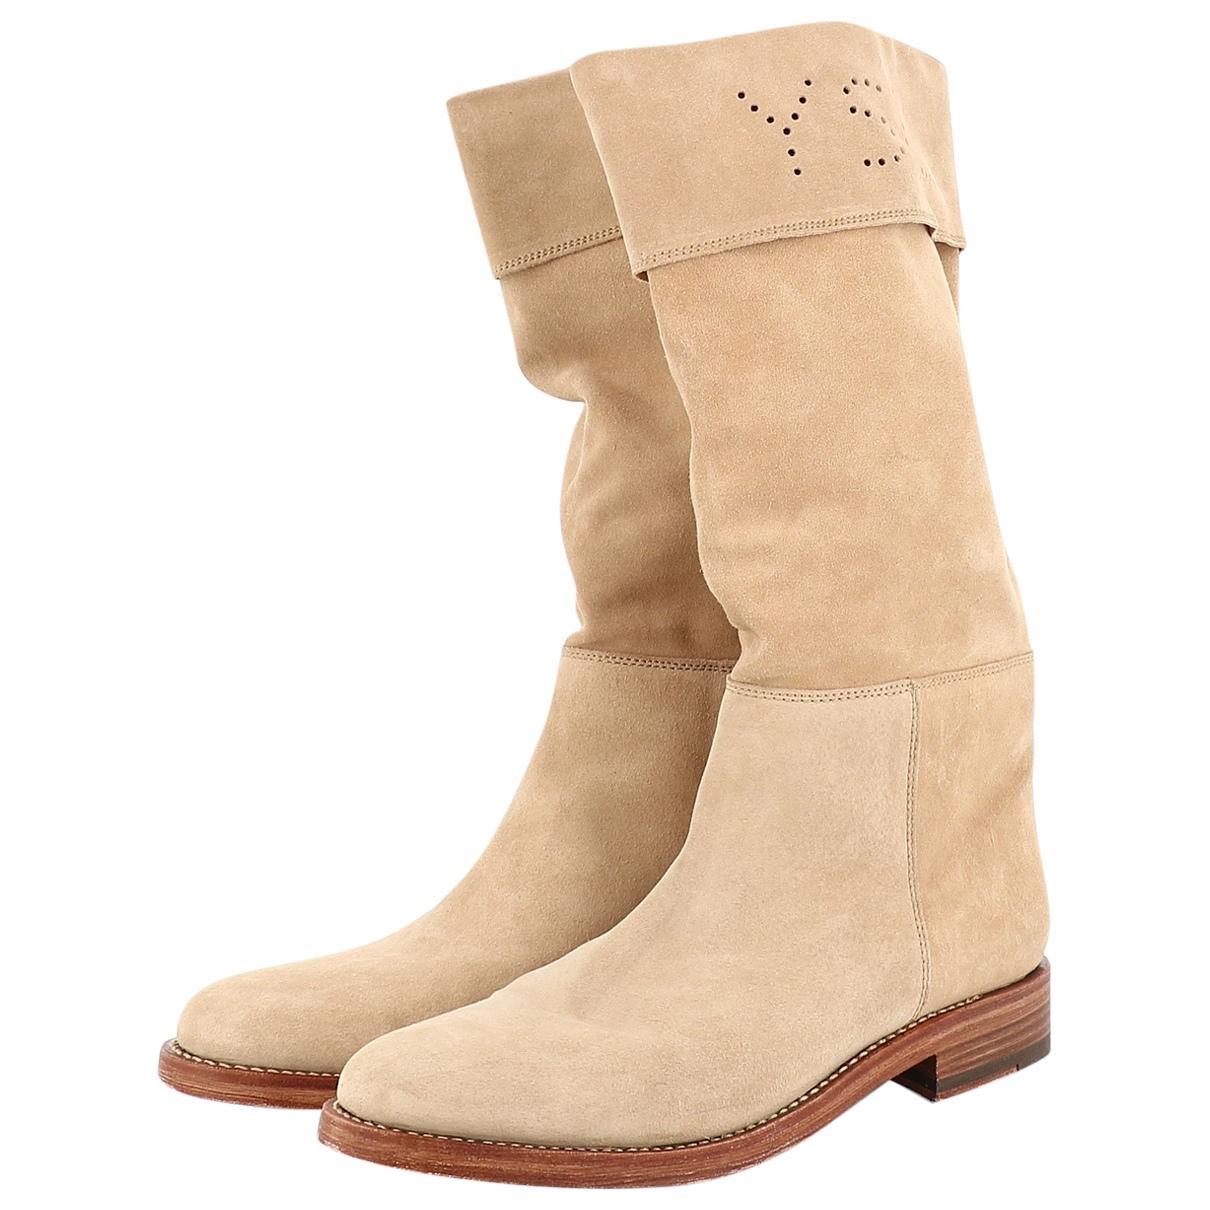 Yves Saint Laurent \N Beige Suede Boots for Women 39.5 EU